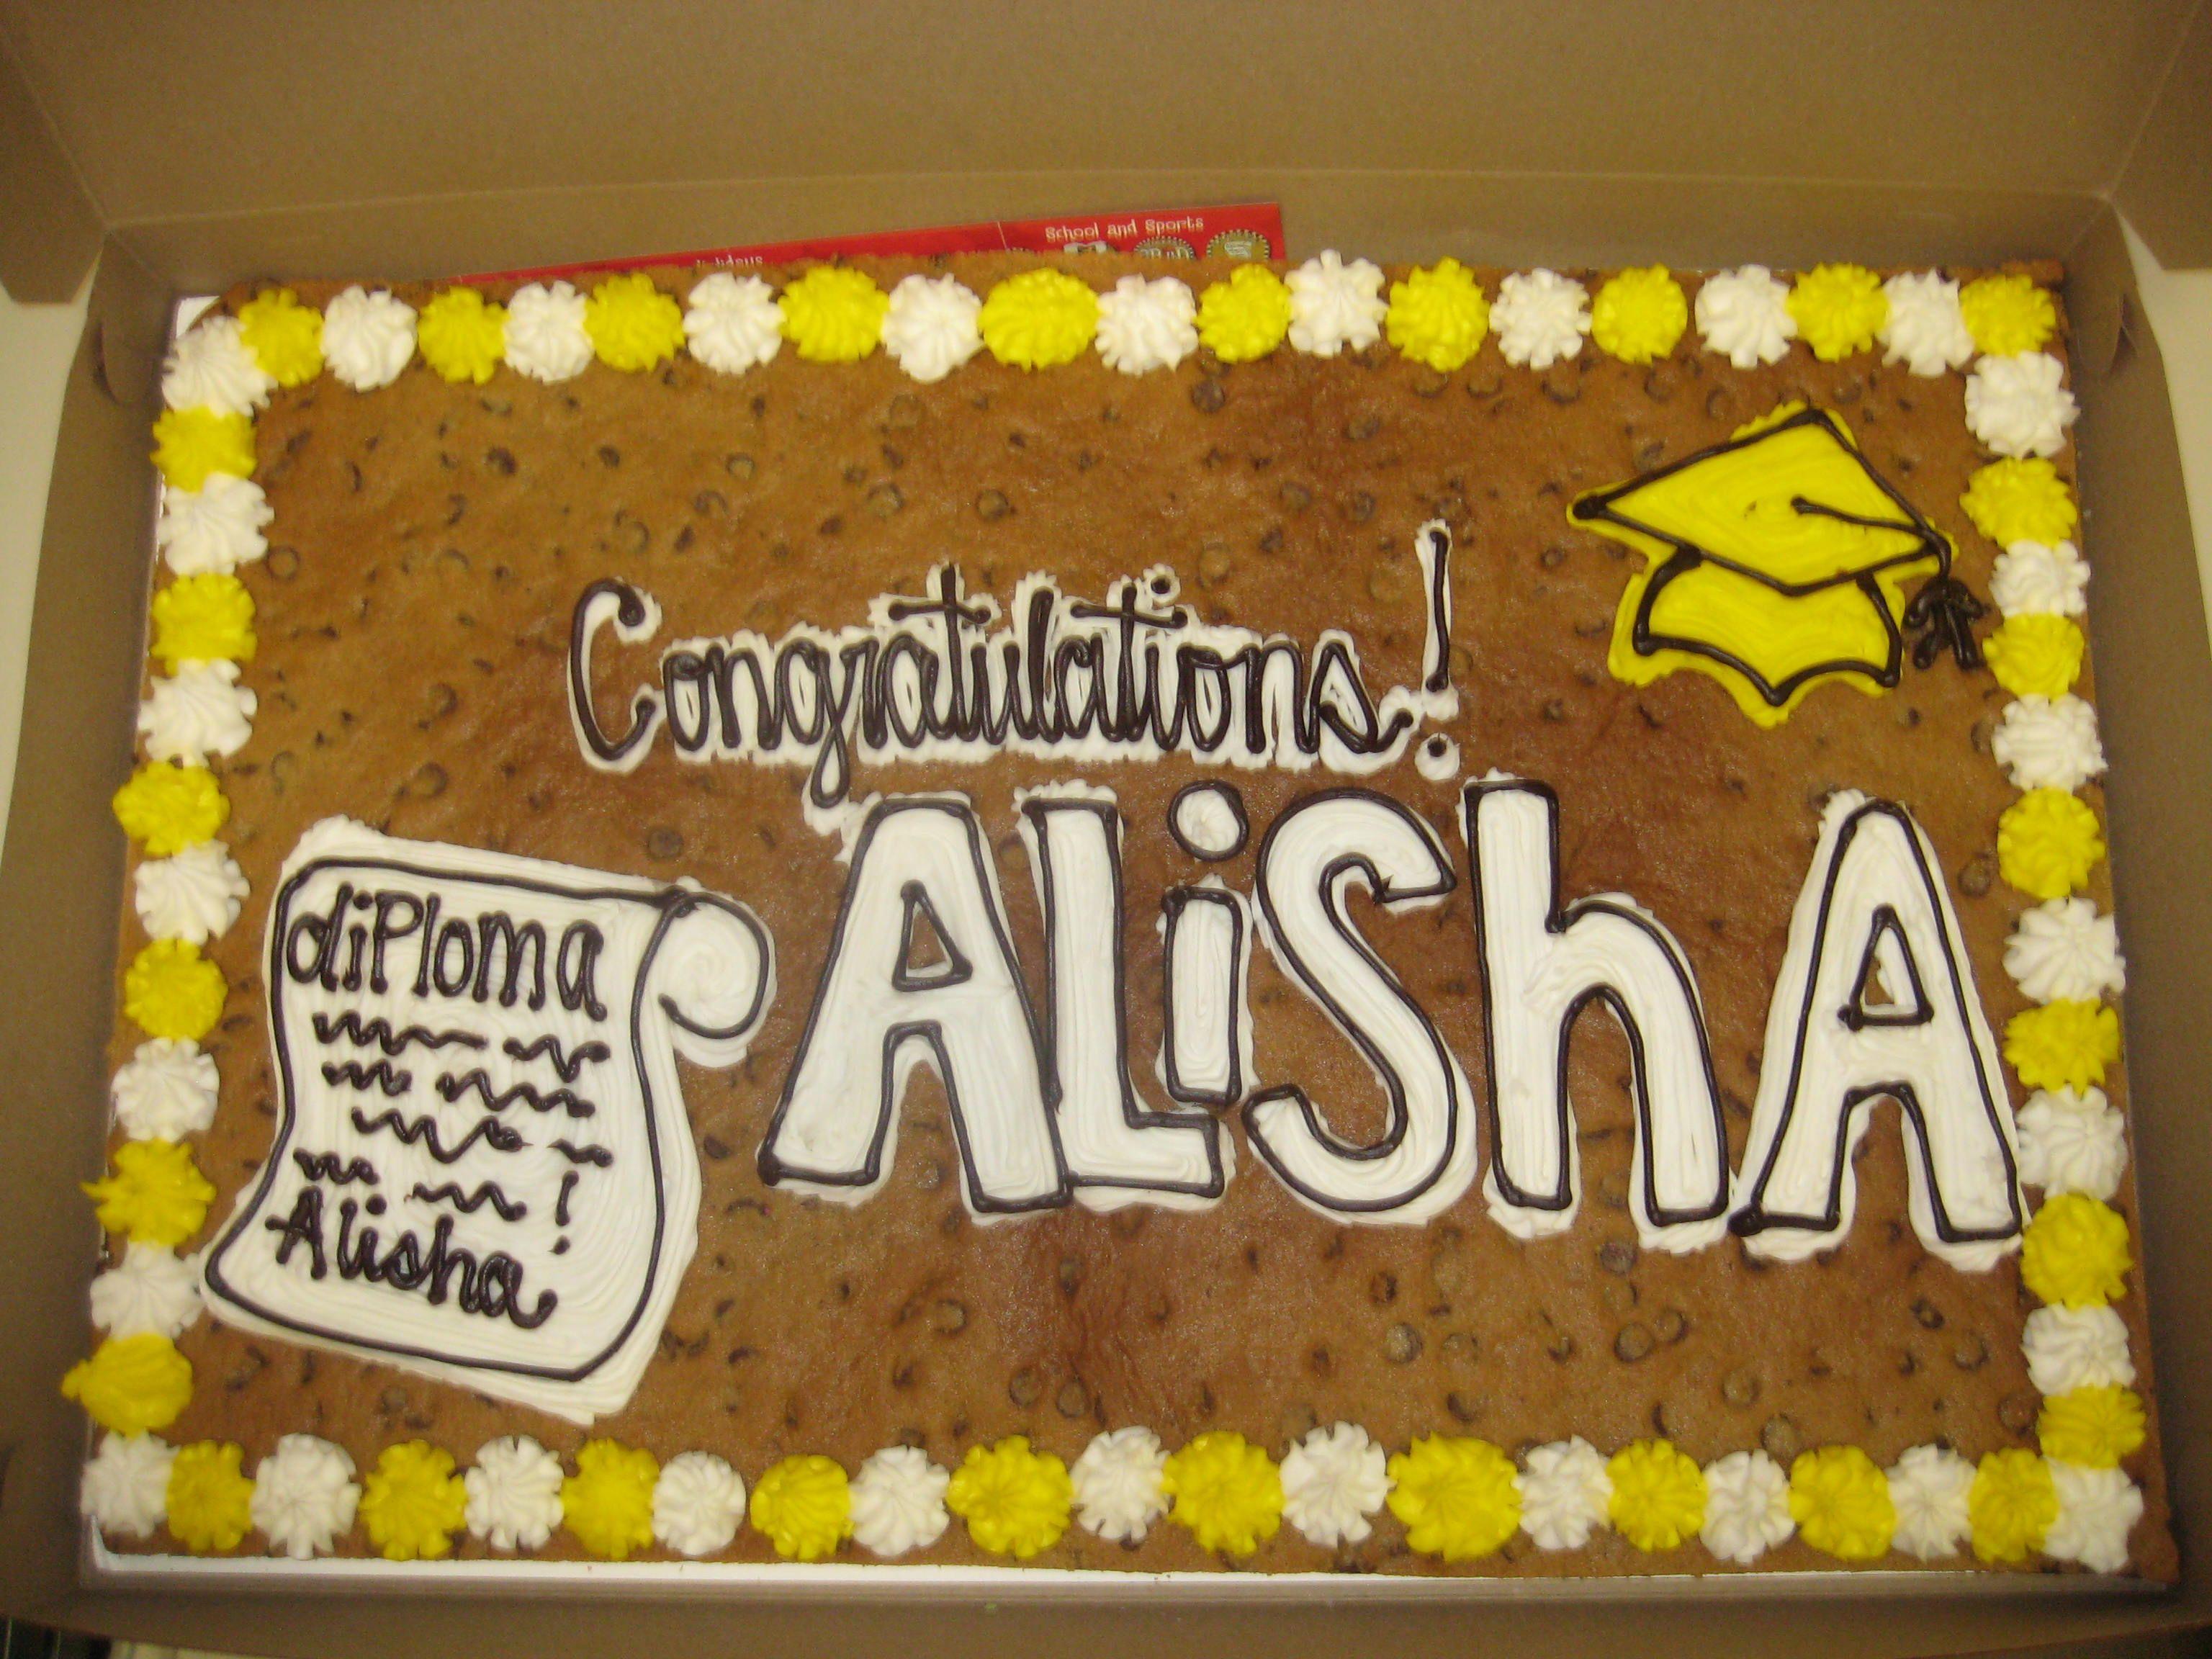 We Love A Celebratory Cookie Cake Congrats Congratulations